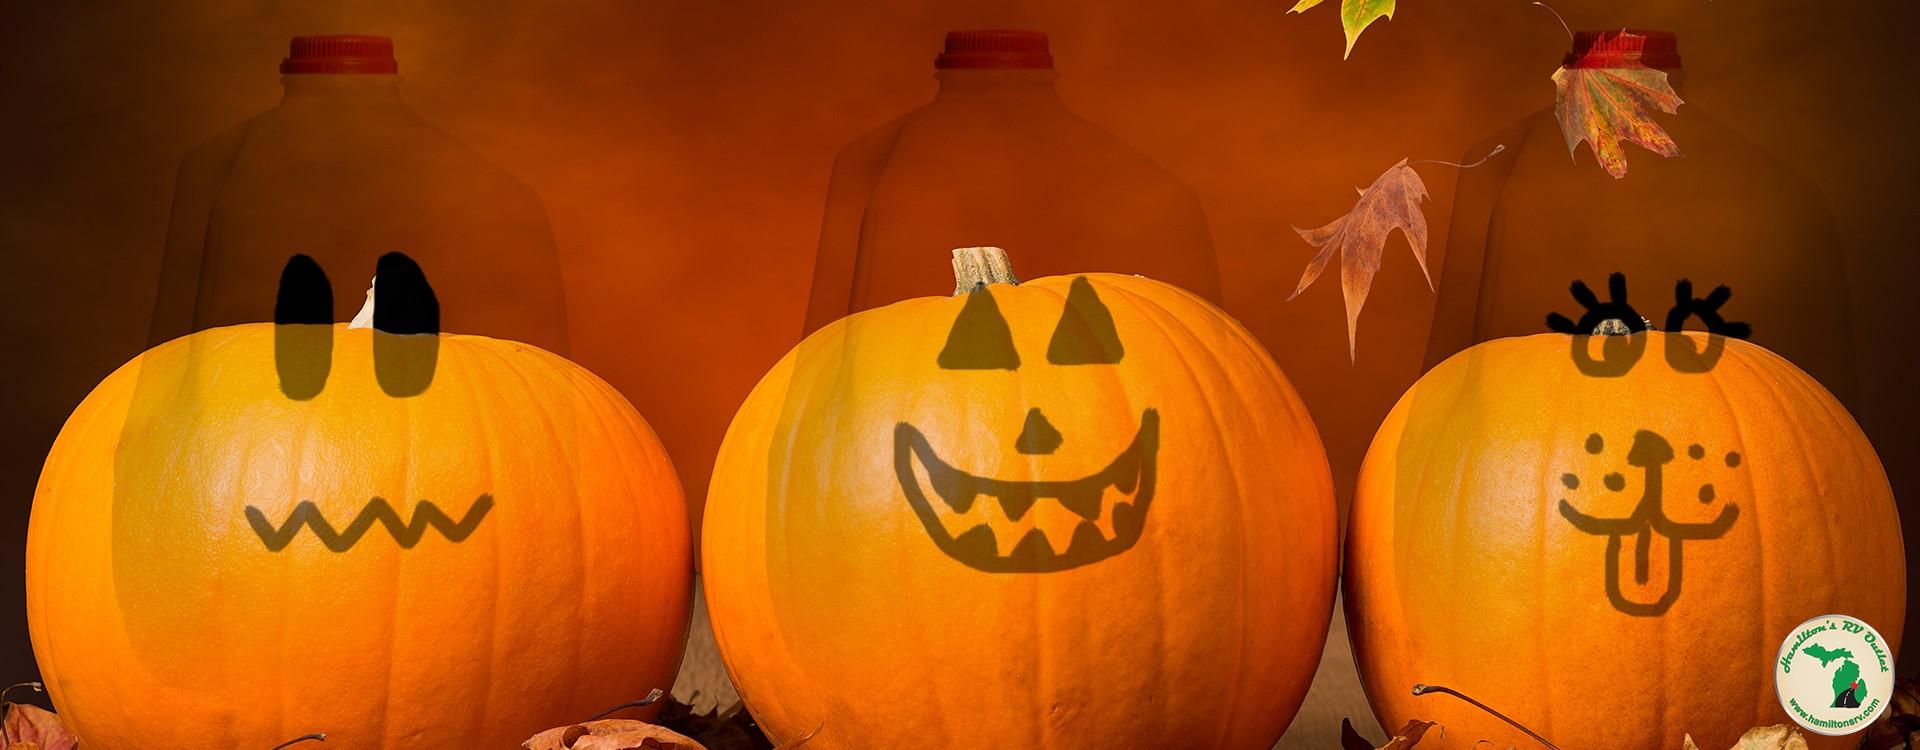 milk jugs and pumpkins